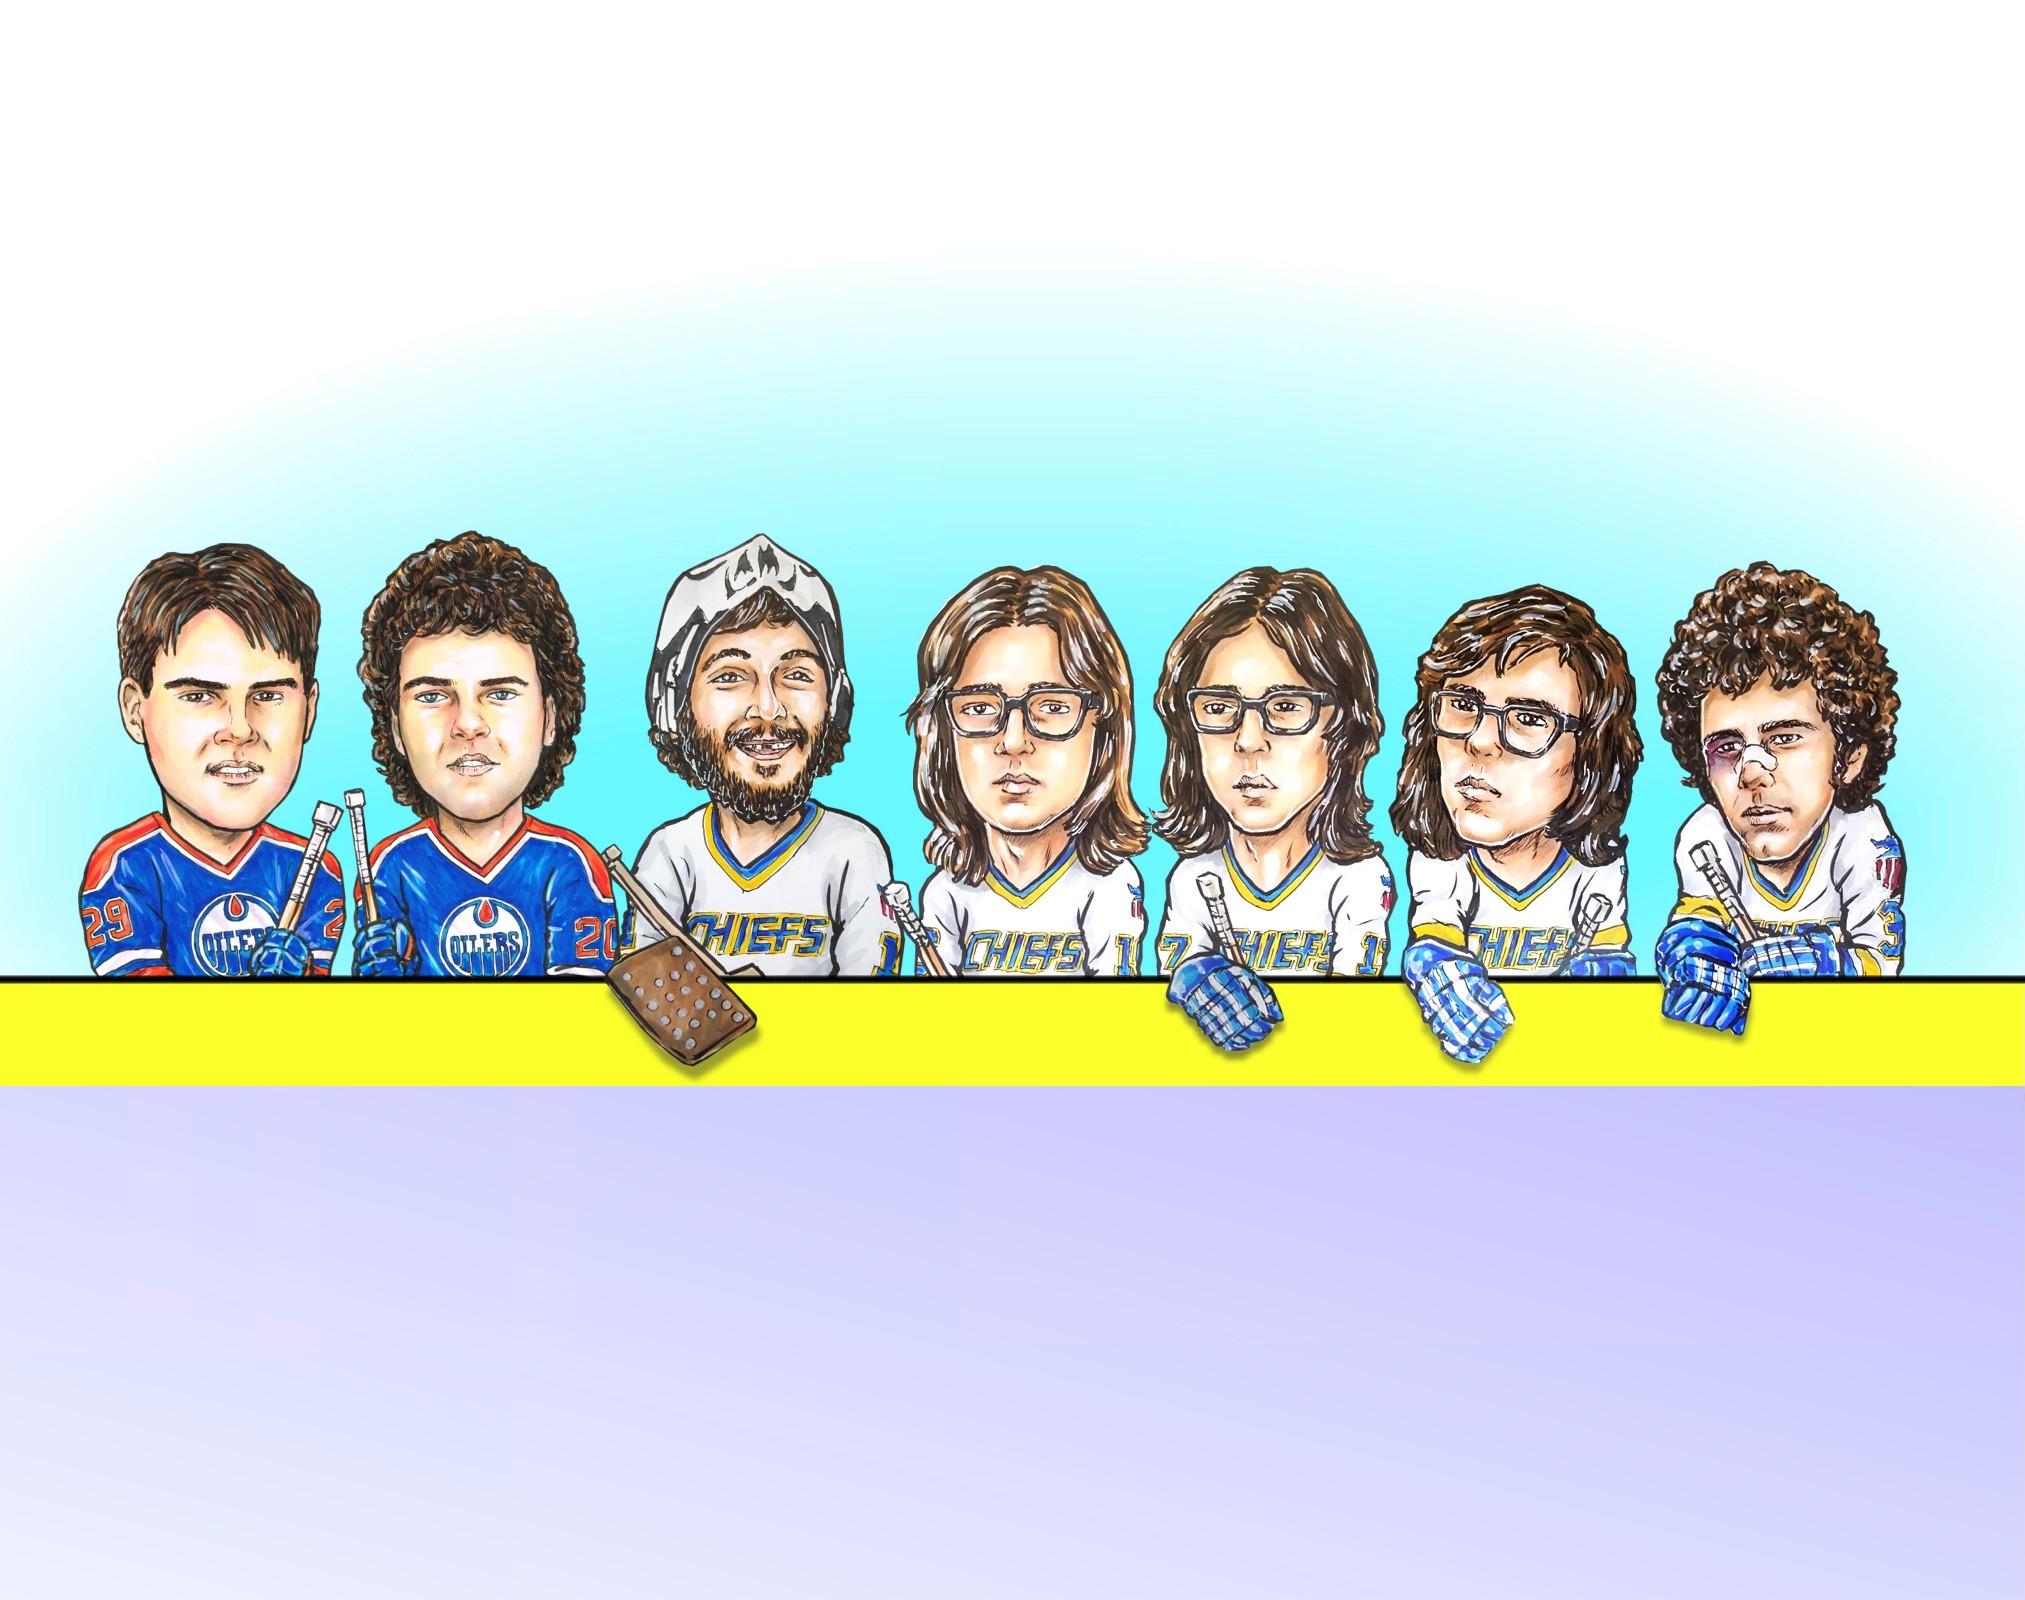 Hinton Hockey, 7 players, jpeg